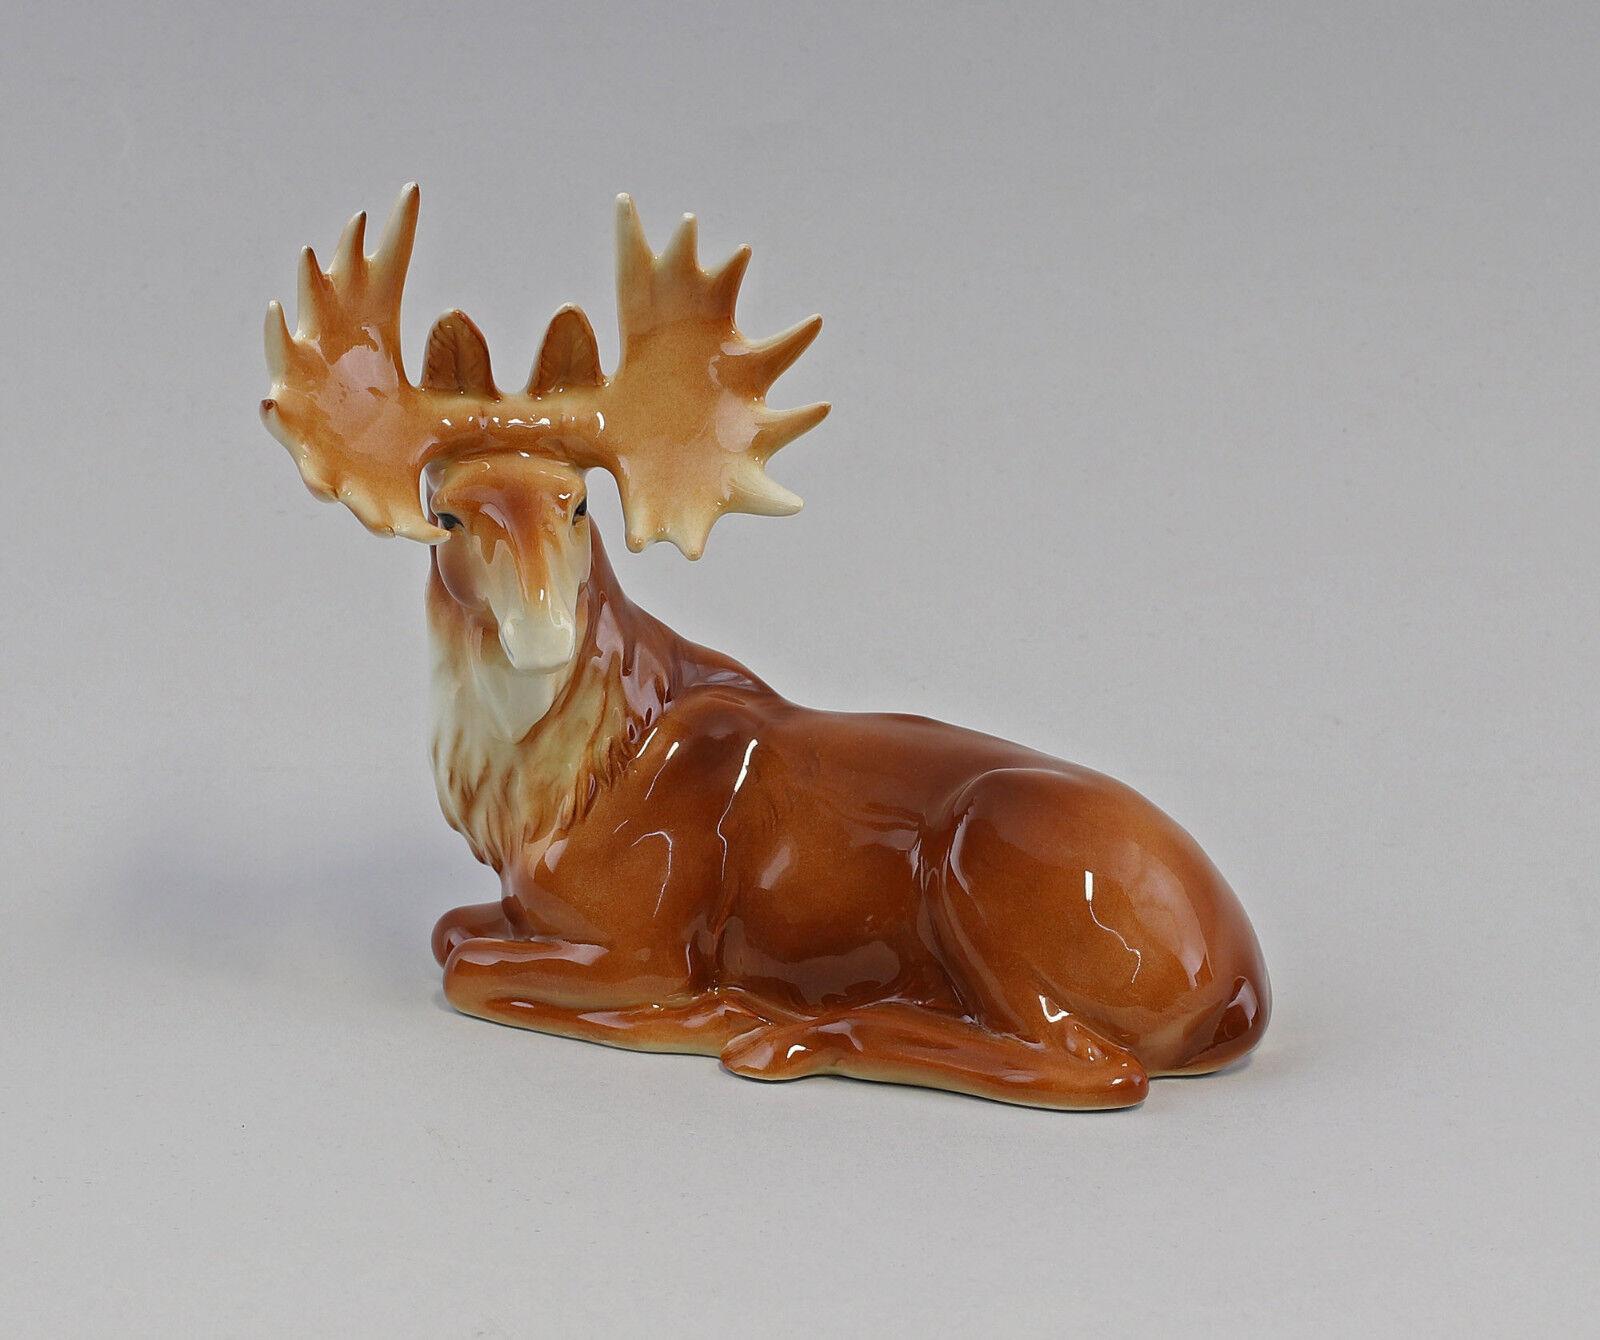 a3-42783 Figurine porcelain Moose Lying Coloured Bisque Wagner&Apel 17x15cm